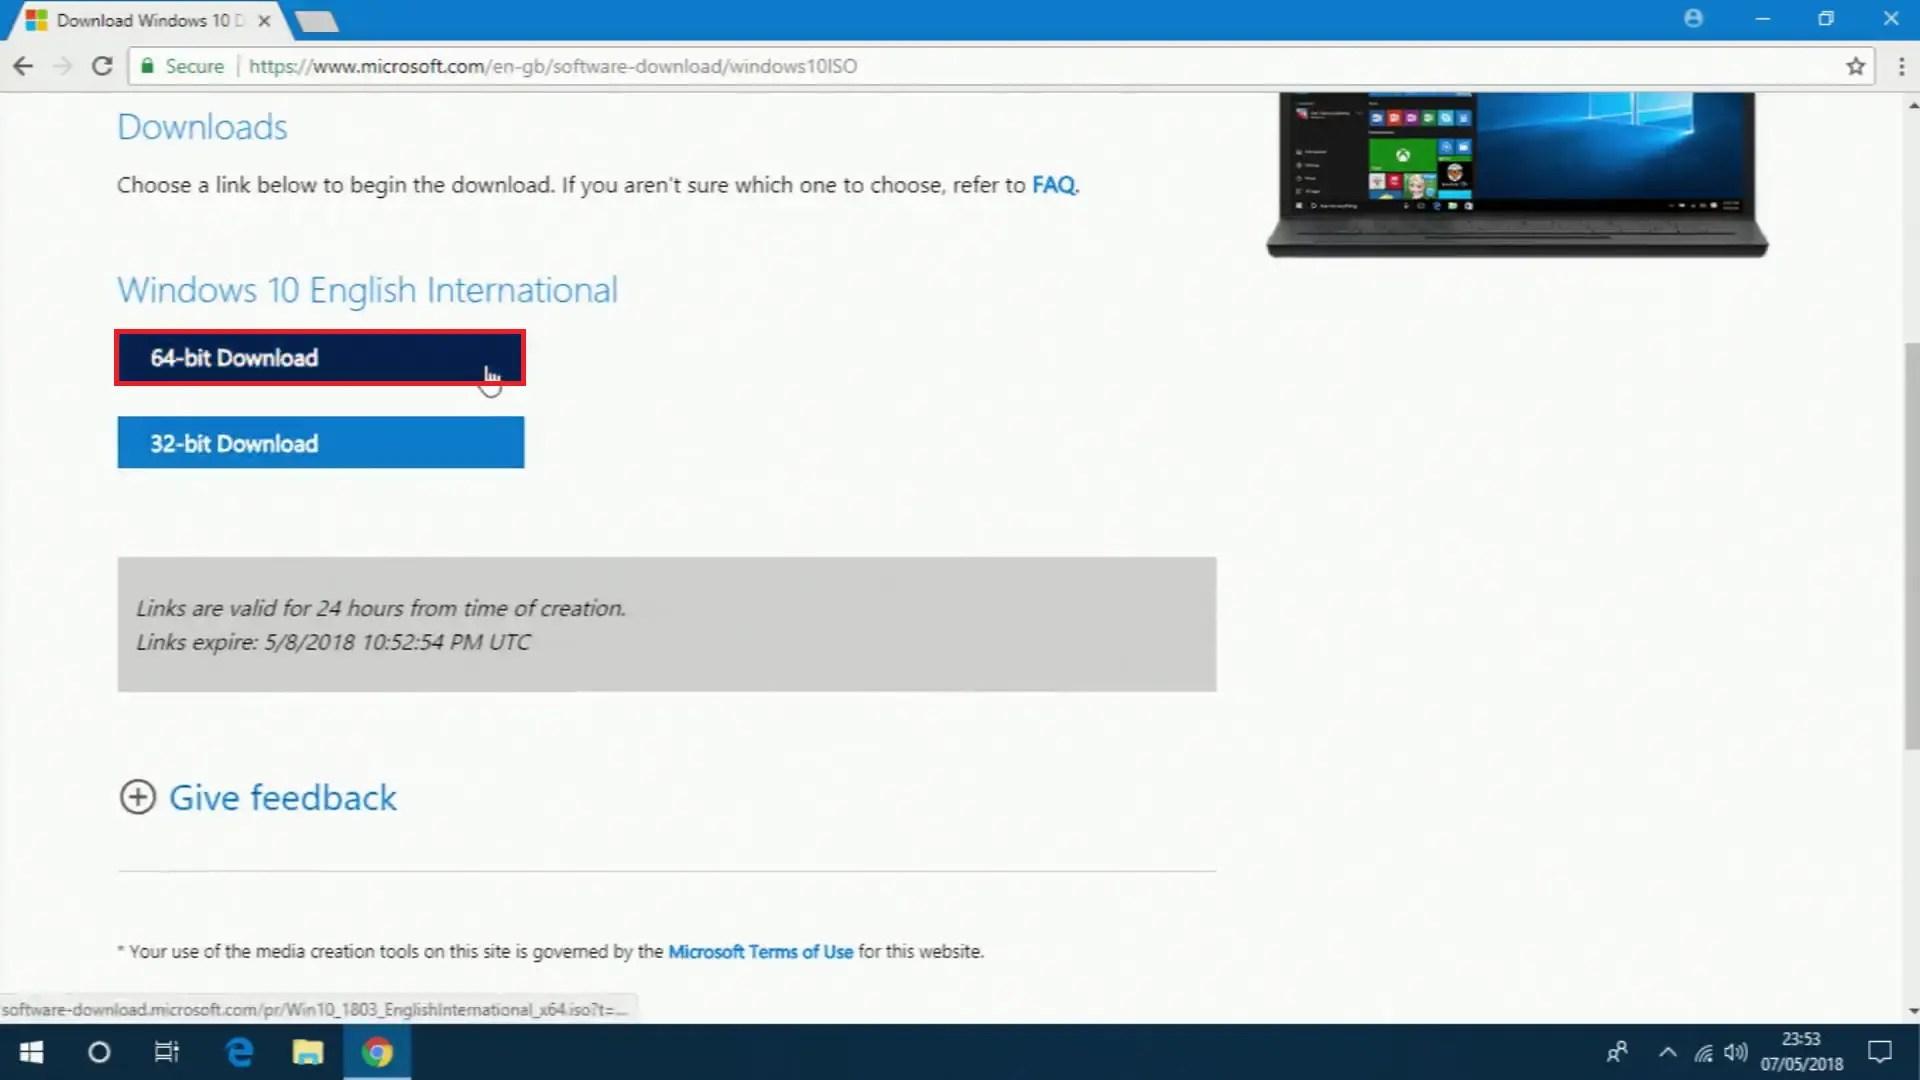 microsoft com downloads - Monza berglauf-verband com